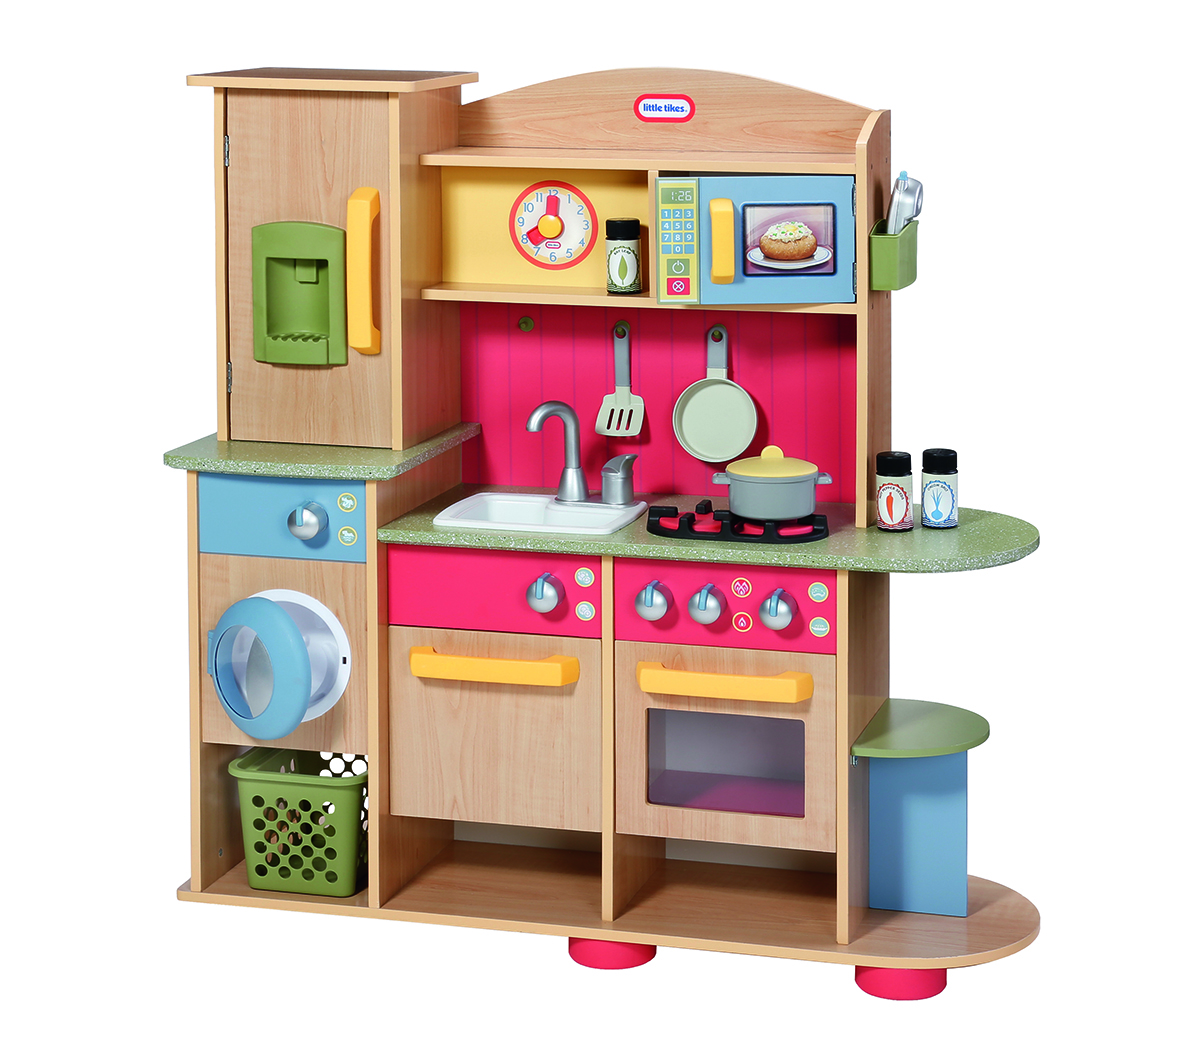 Marvelous Cookin Creations Premium Wood Kitchen Download Free Architecture Designs Viewormadebymaigaardcom